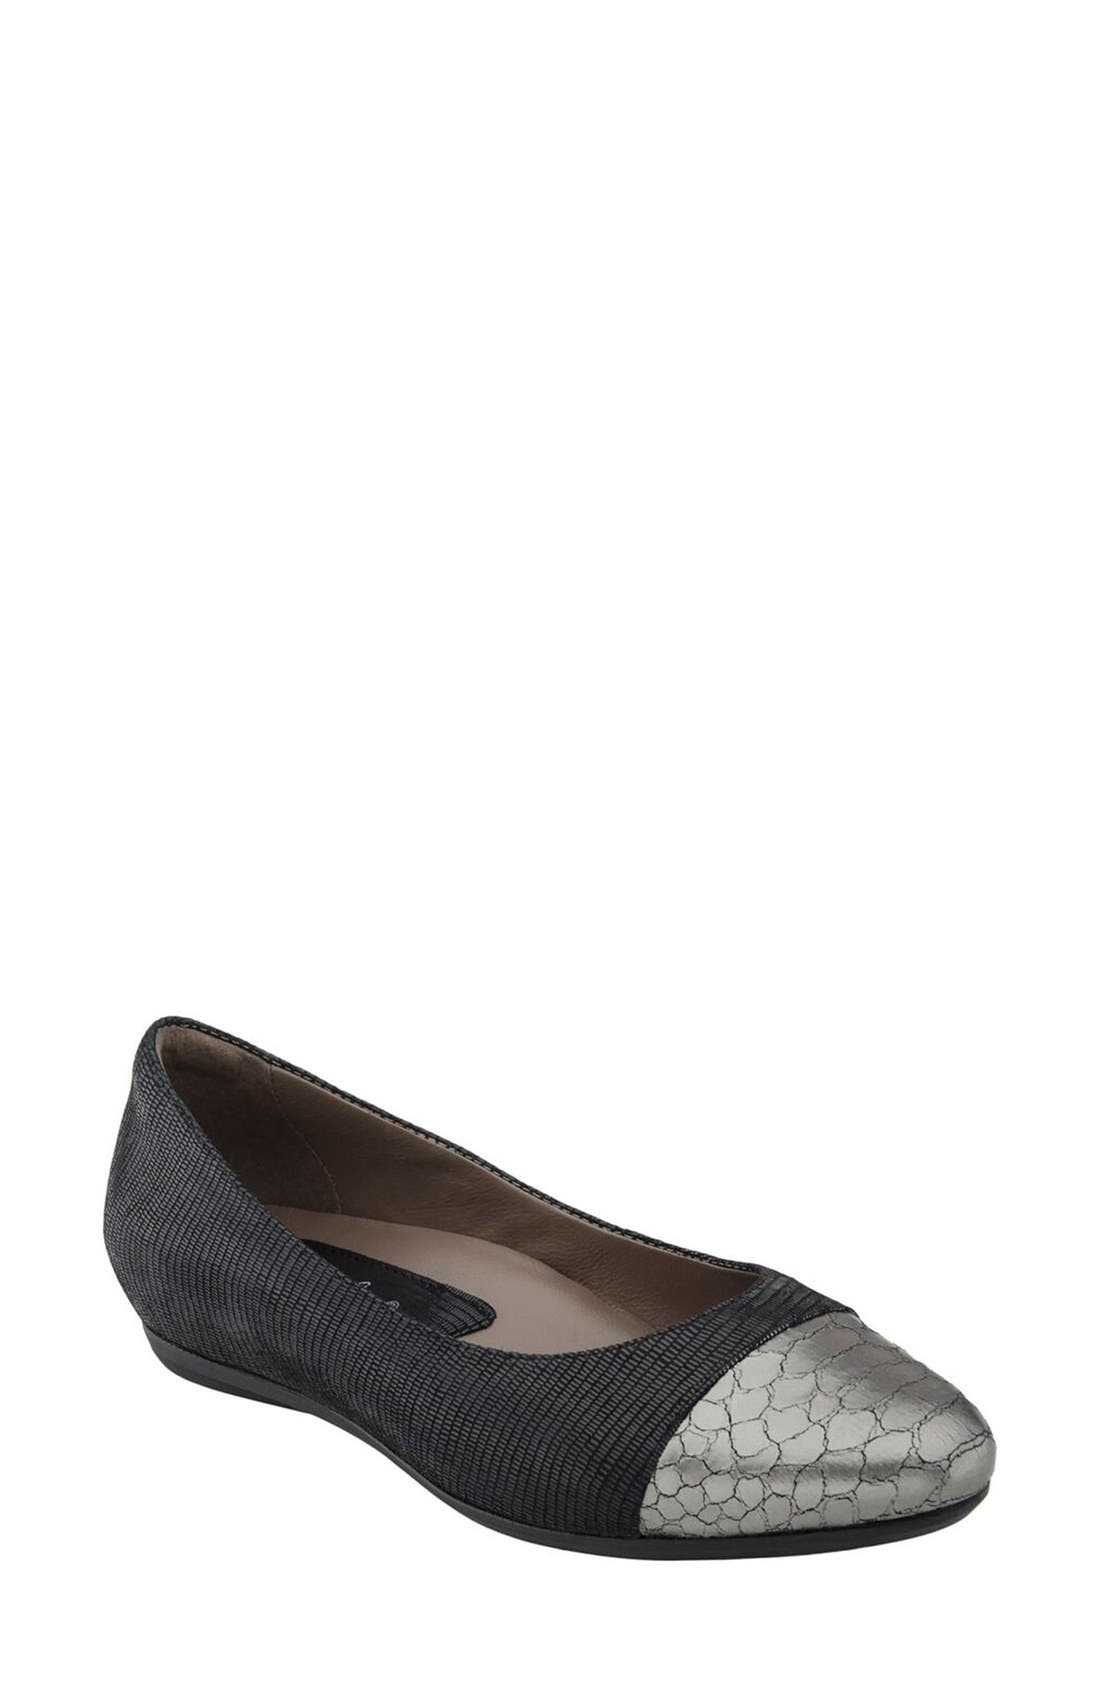 Earthies® 'Hanover' Cap Toe Flat (Women)